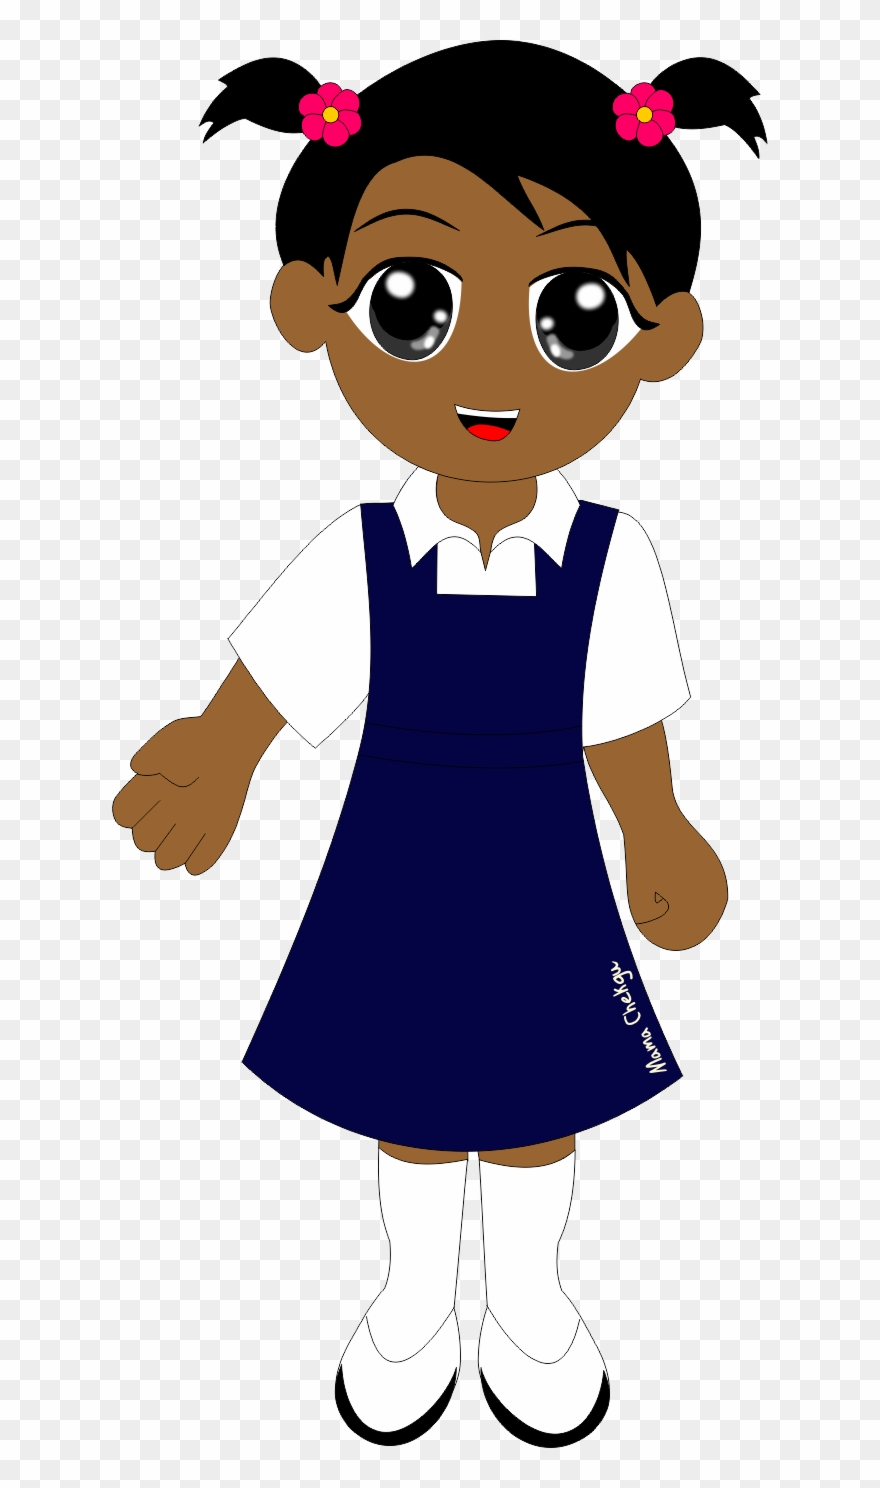 Ni Mc Upload Student Sekolah Menengah Sekolah Rendah Kartun Murid Sekolah Rendah Clipart 3707096 Pinclipart